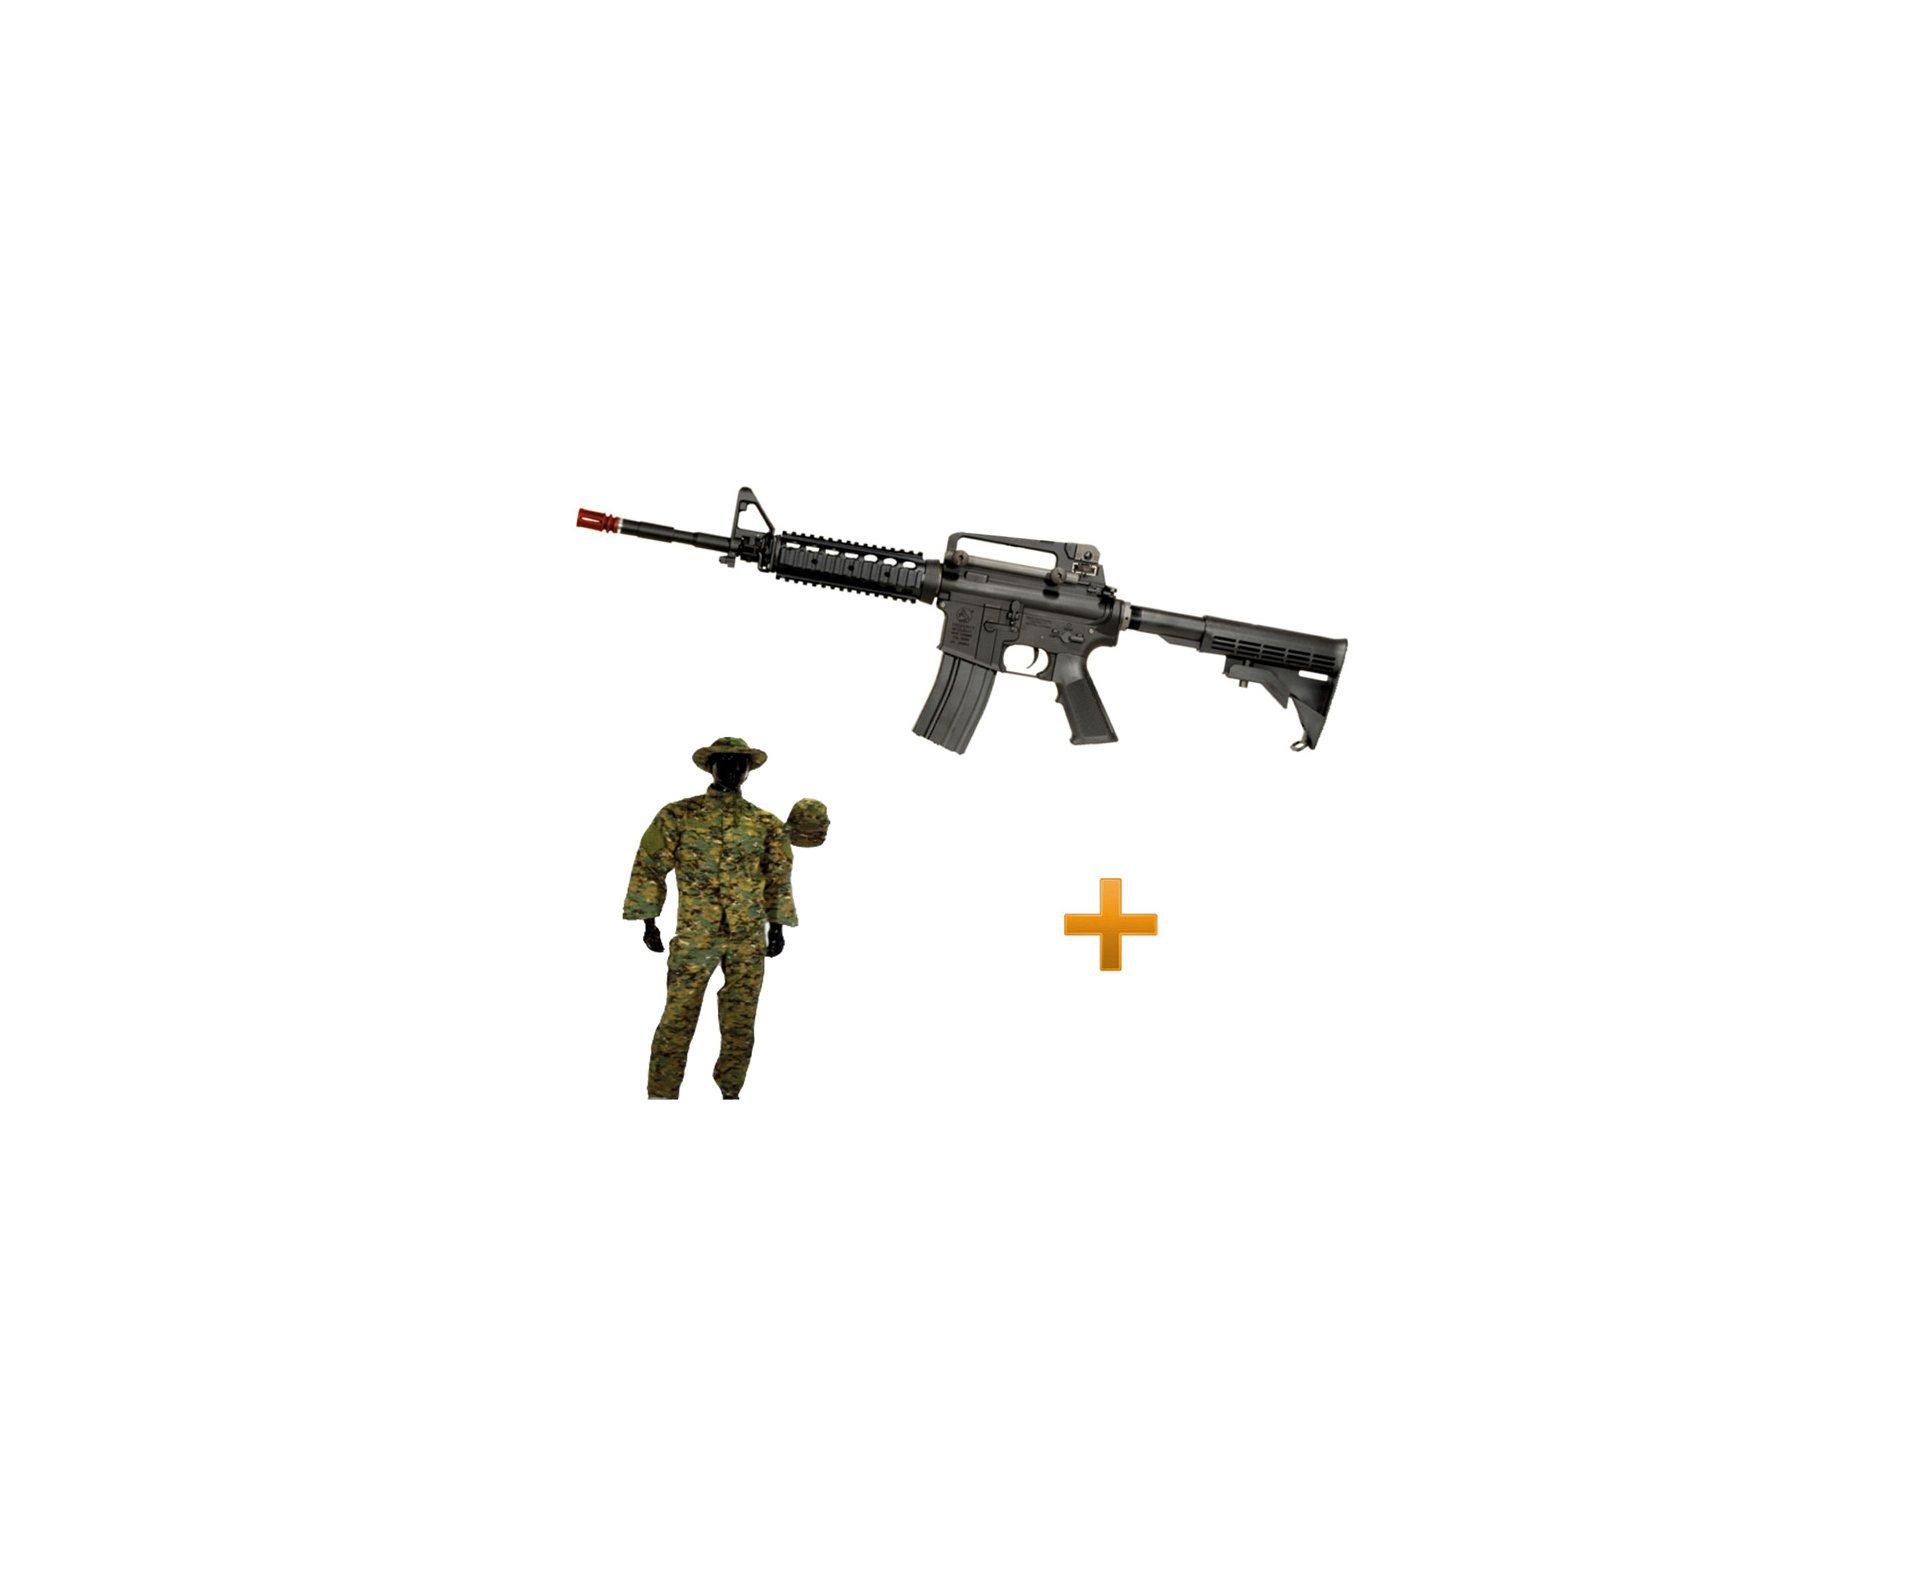 Rifle De Airsoft Colt M4a1ris Cal 6,0 Mm - King Arms + Farda Marpat Digital Selva Swiss+arms - Tamanho Gg